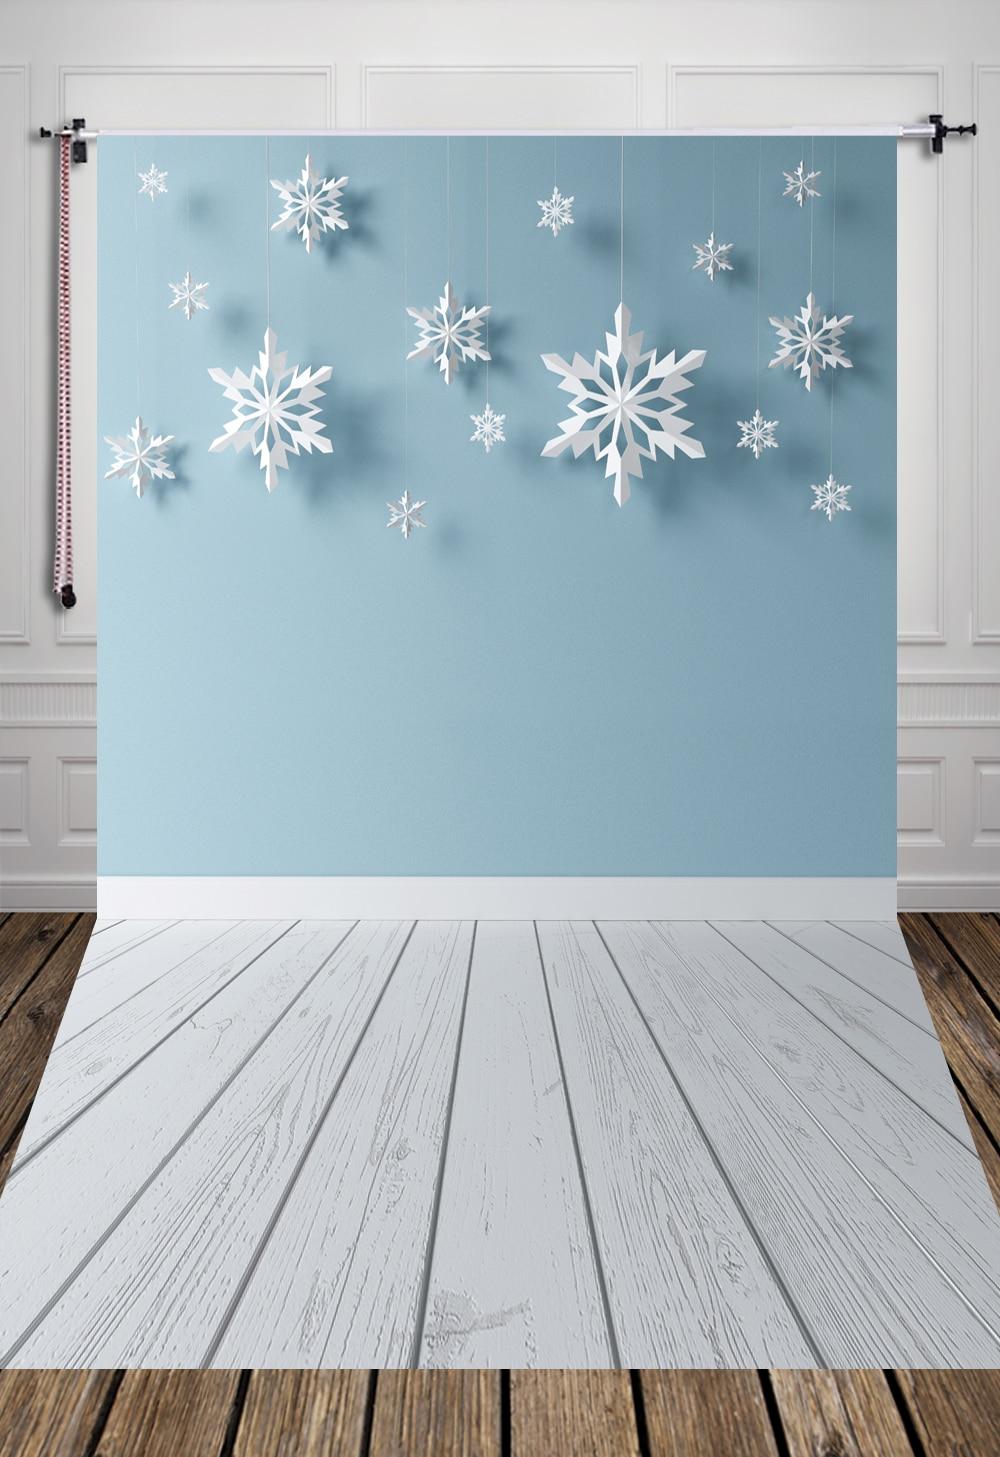 HUAYI Photography Backdrop christmas backdrops Photo Prop Christmas decoration Art Fabric backgrounds D-2394